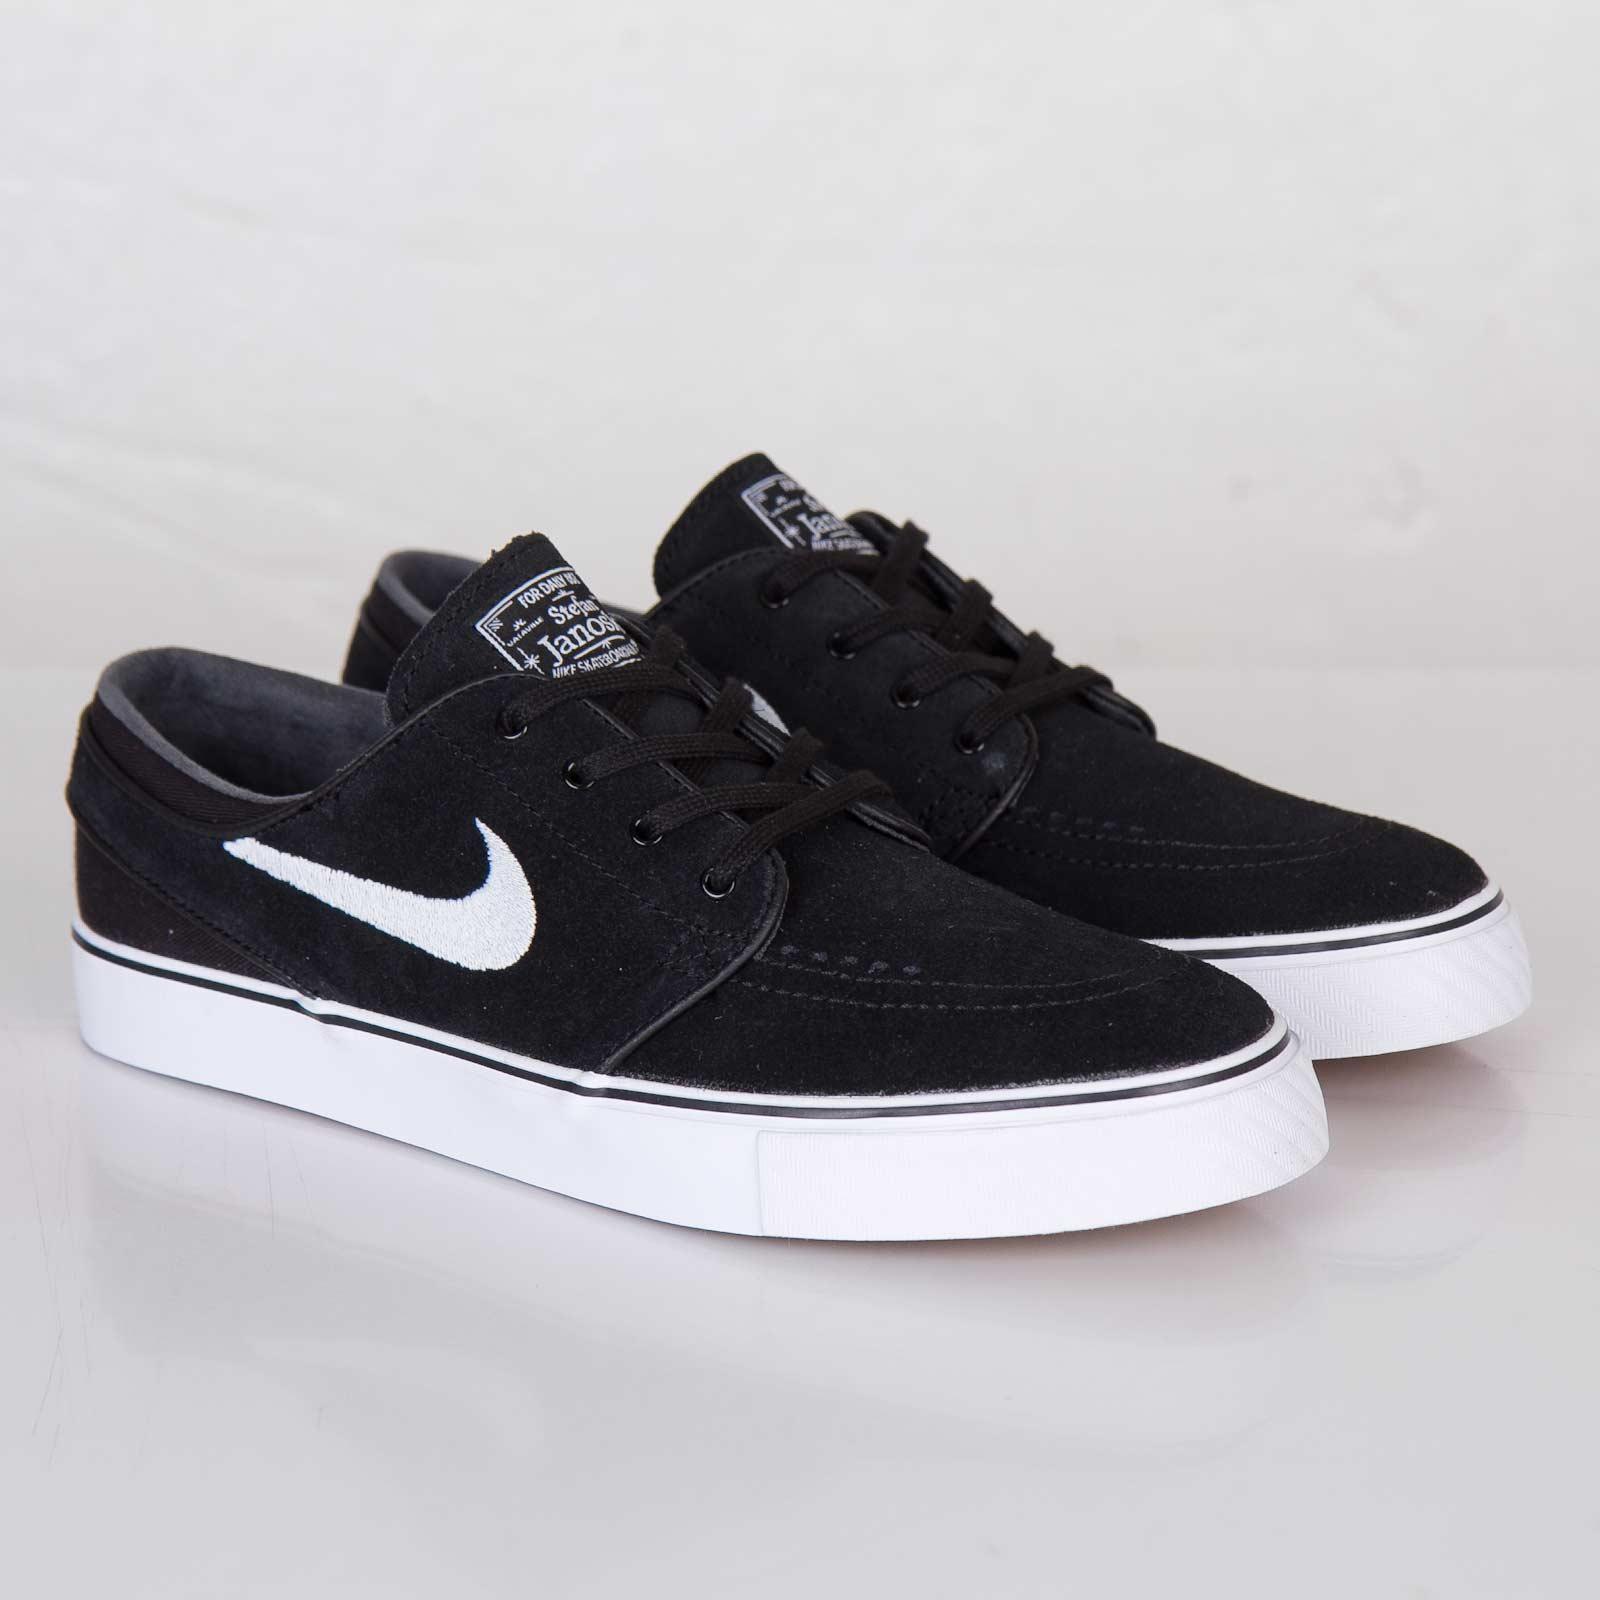 Nike SB rea